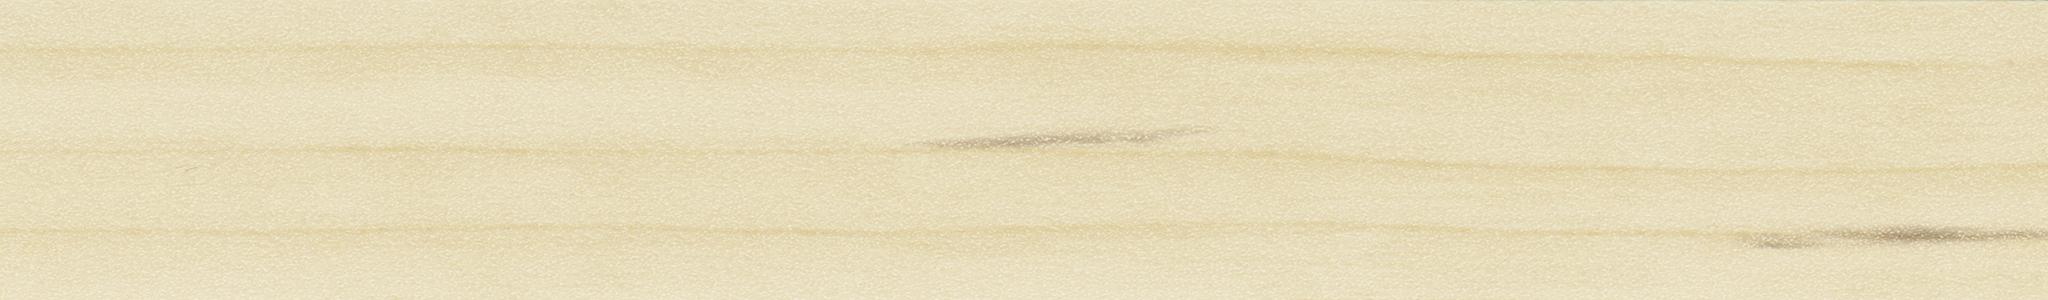 HD 263840 ABS hrana javor Mandal perla